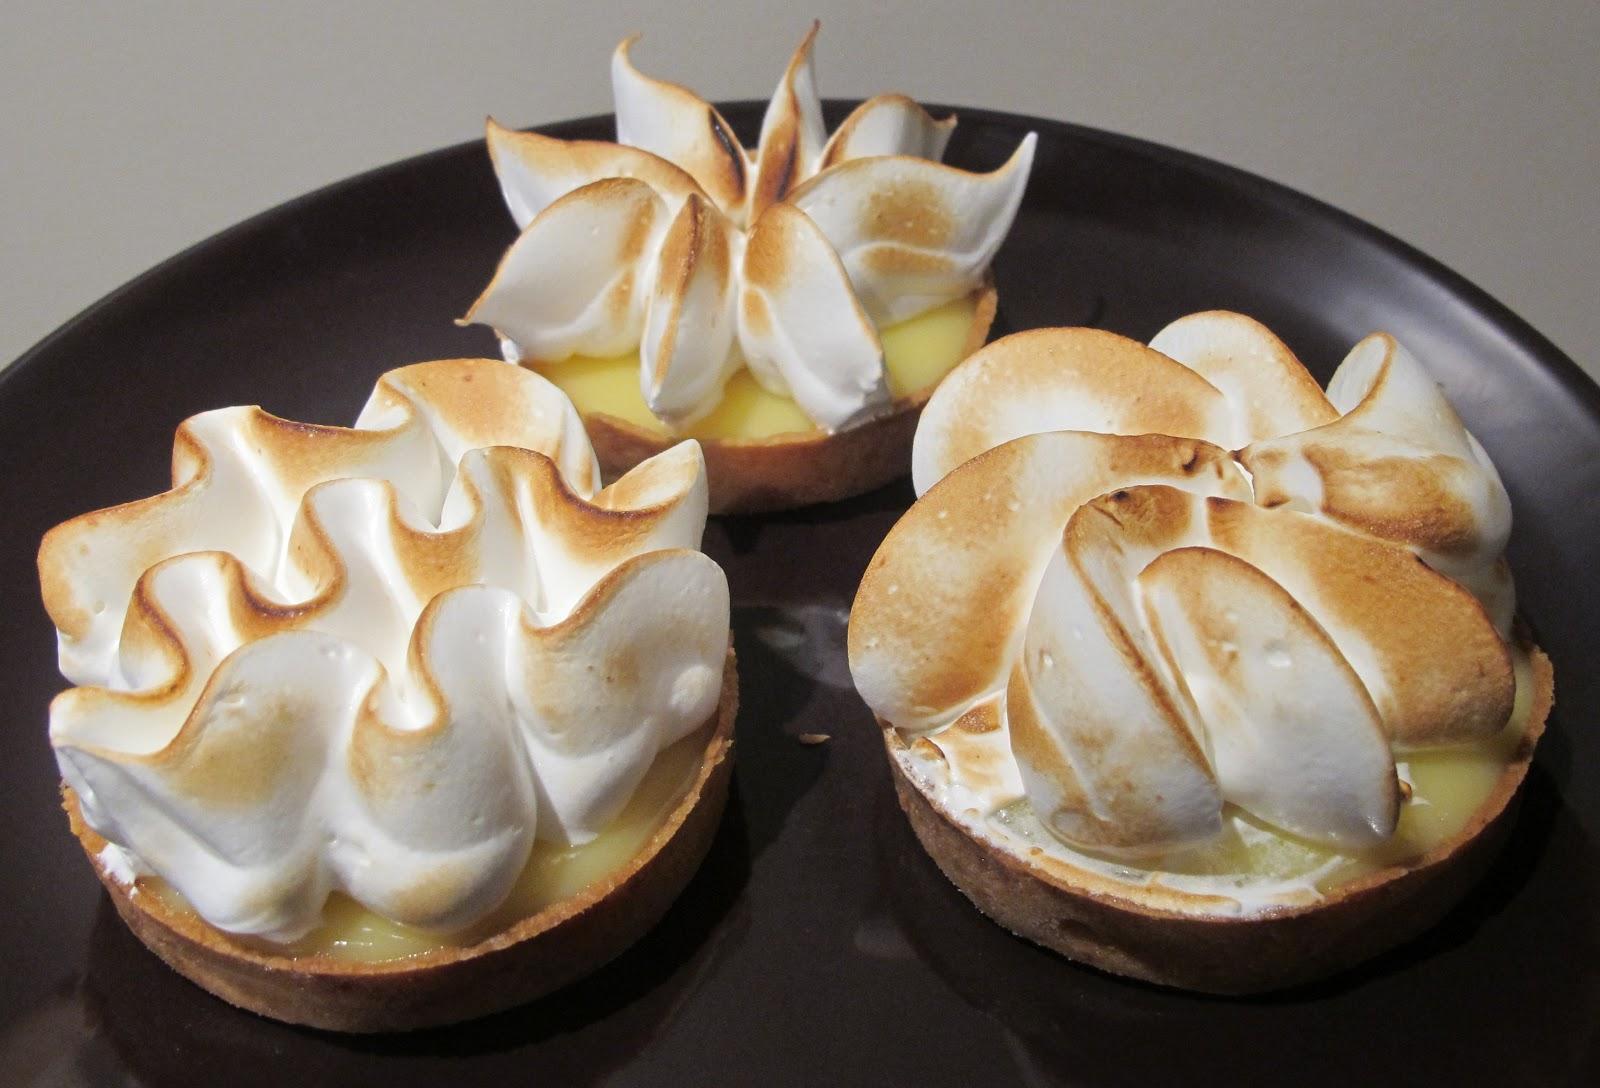 Croque en bouche tarte au citron meringu e - Tarte au citron meringuee herve cuisine ...